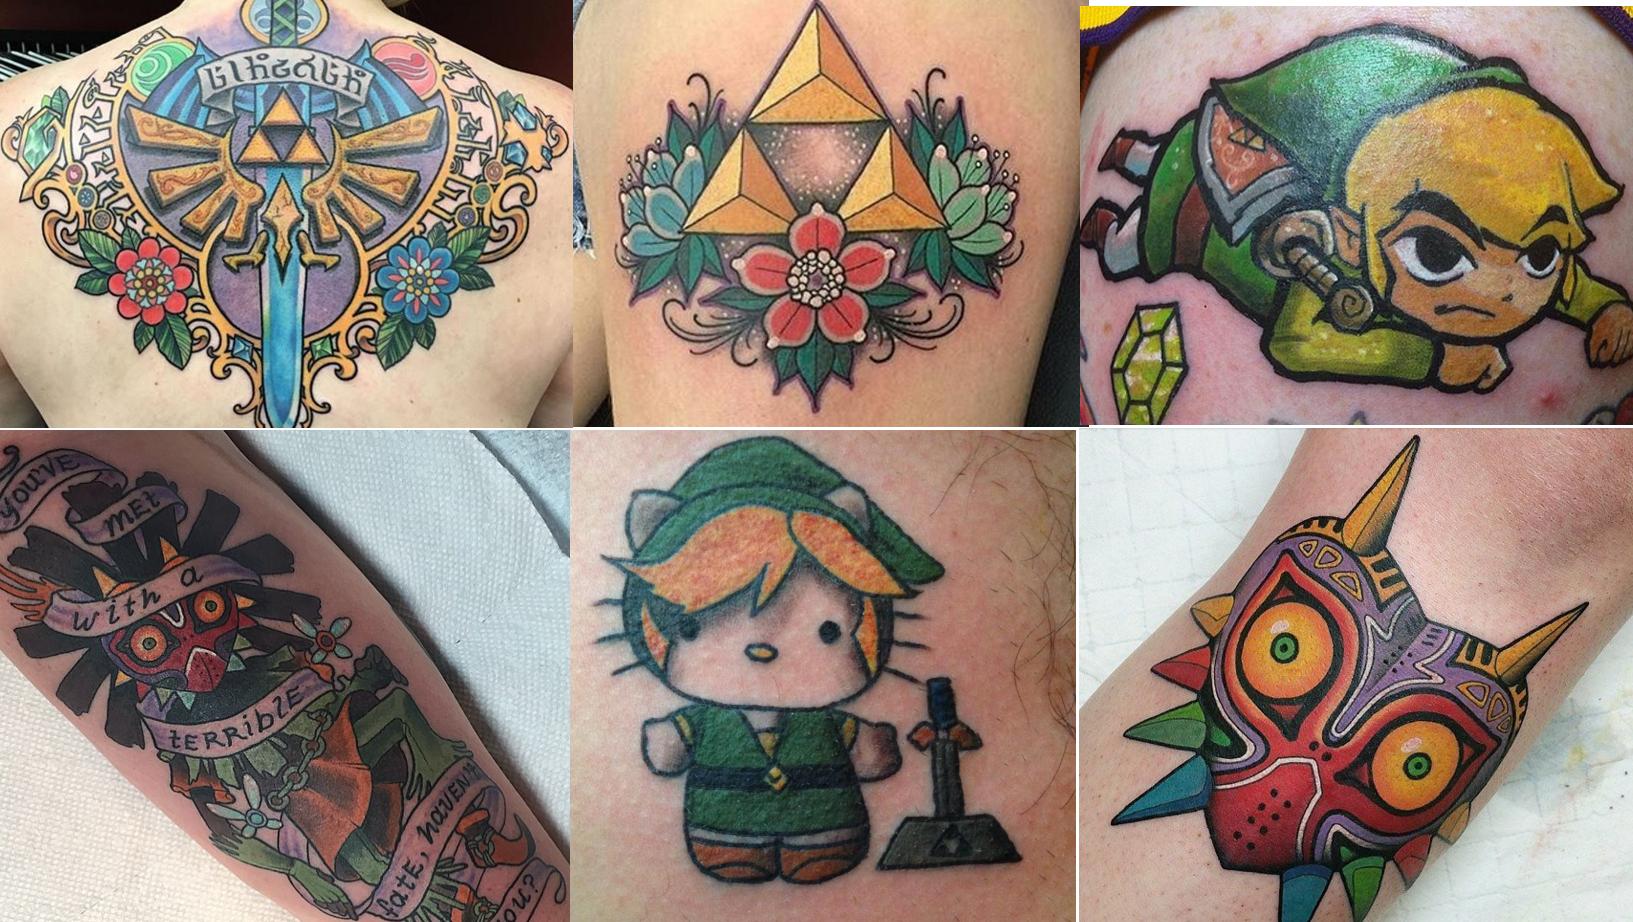 Legend of Zelda Tattoos  30th anniversary